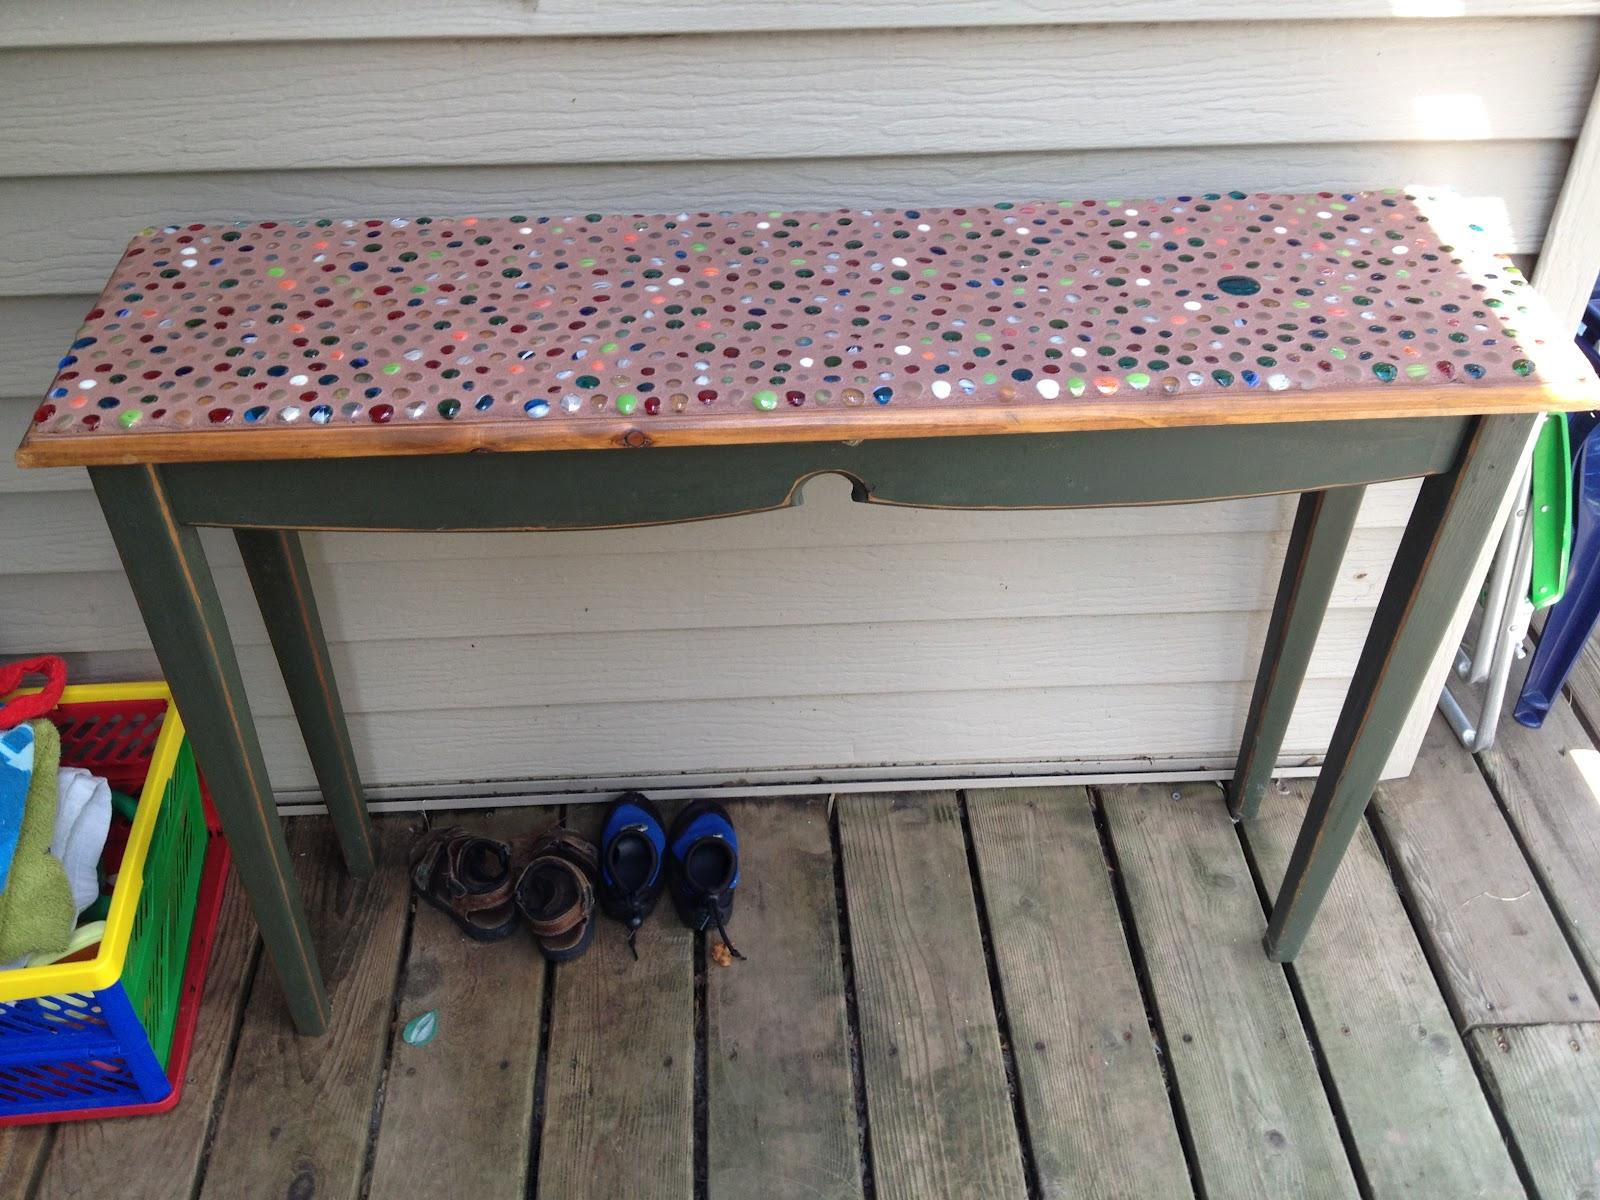 Junk Mail Gems: DIY Marble Mosaic Table Top